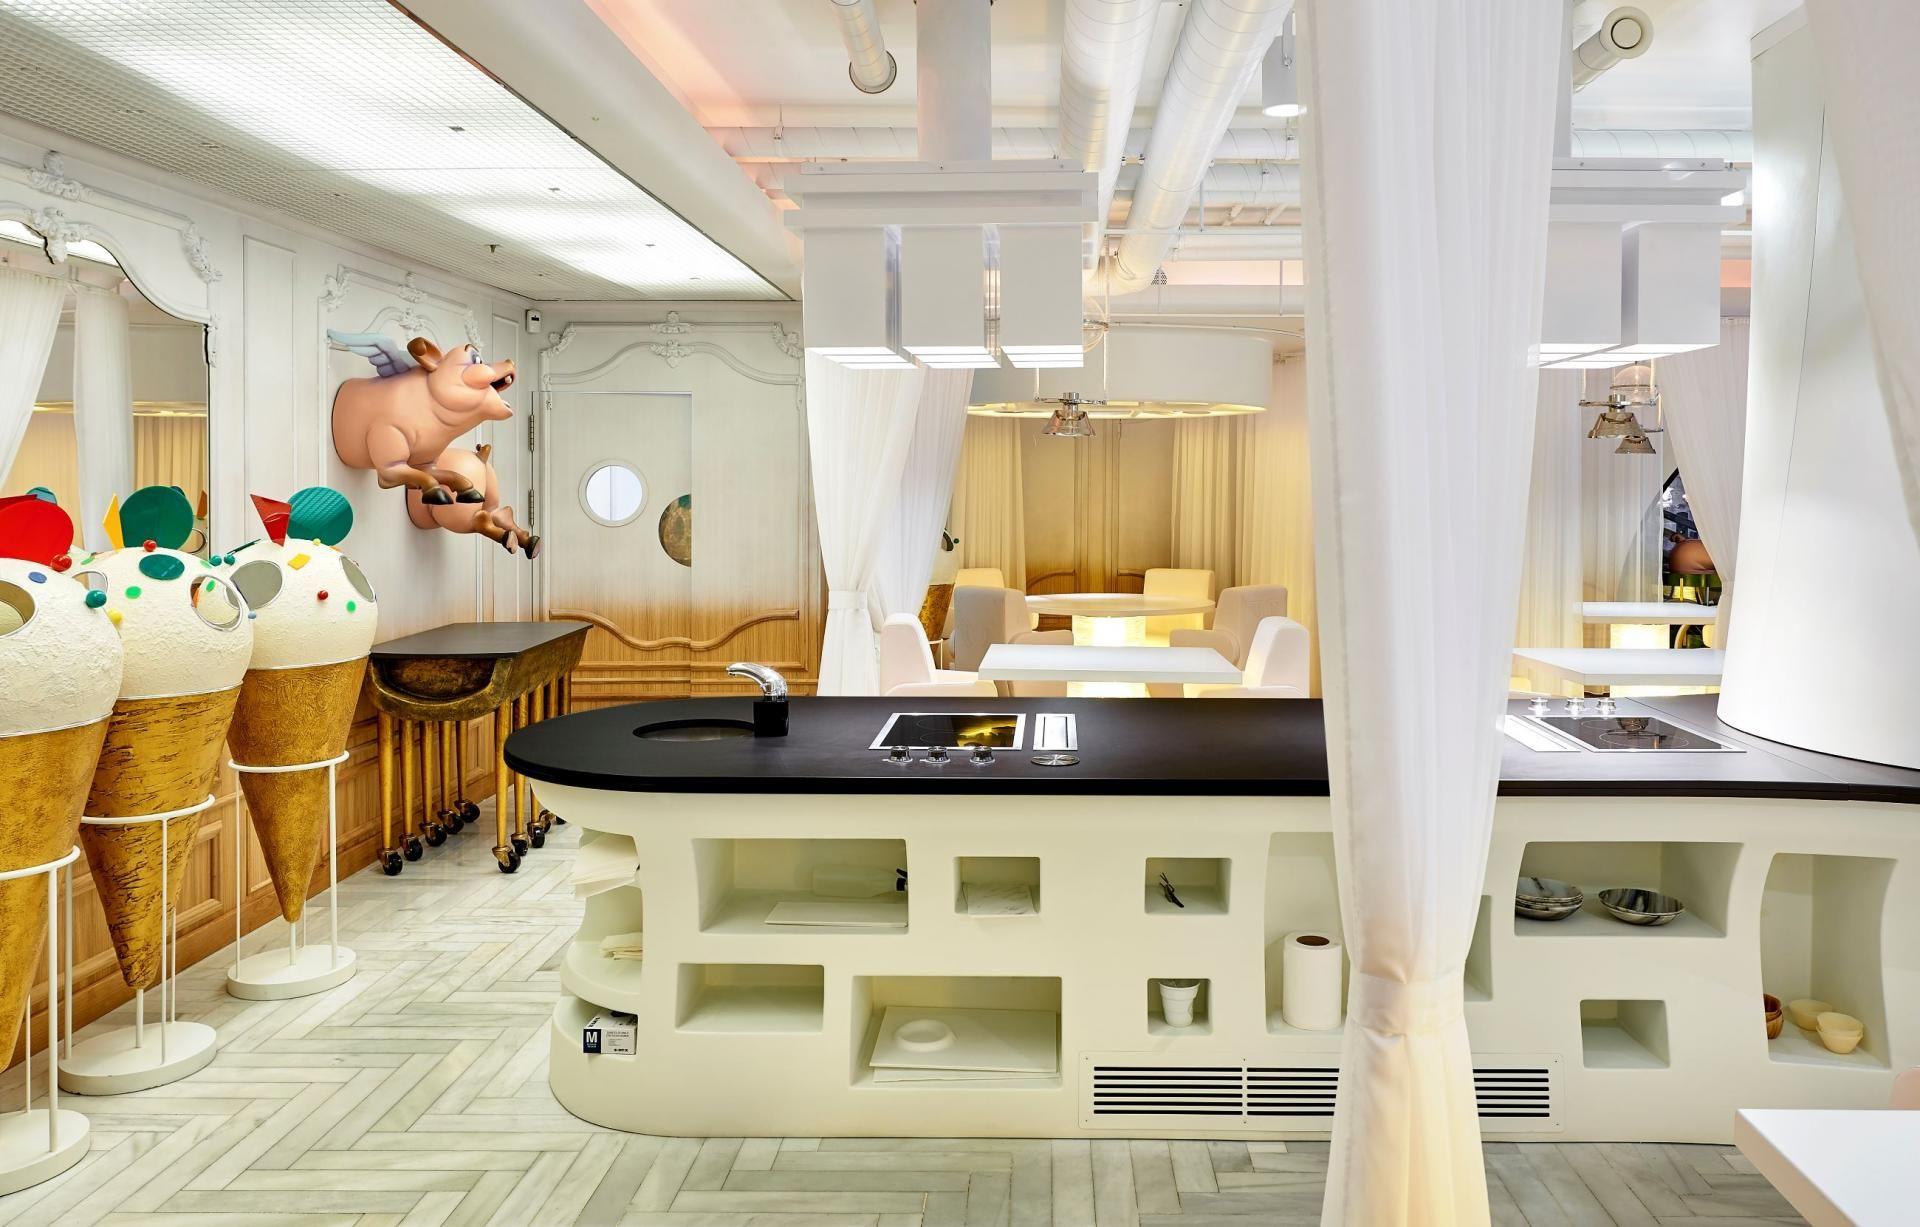 Large Format Ultra Compact Surface By Cosentino Diverxo Interiores Diseño De Interiores